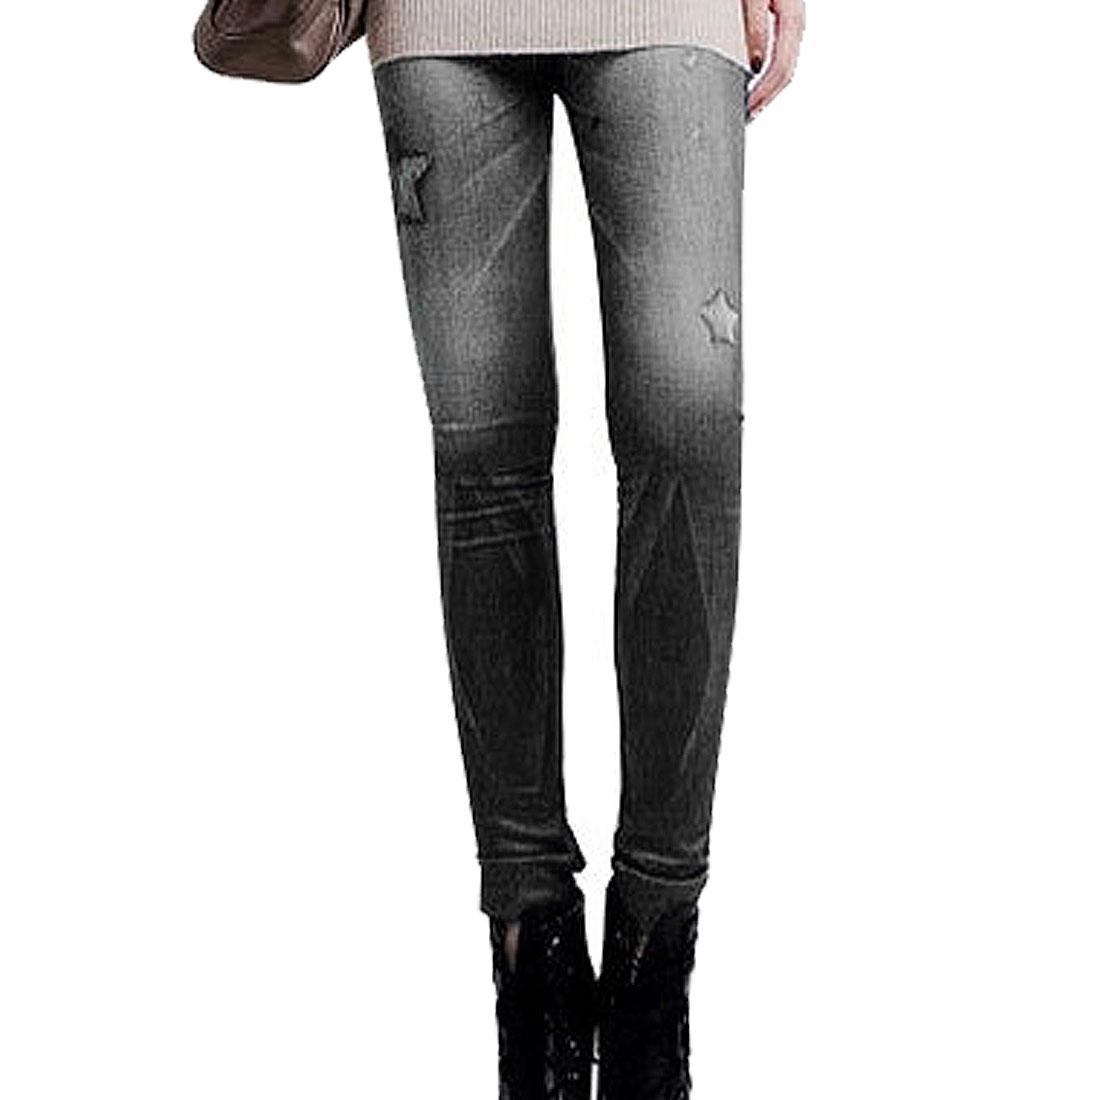 Women Star Pattern Stretchy Skinny Close-fitting Leggings Black XS